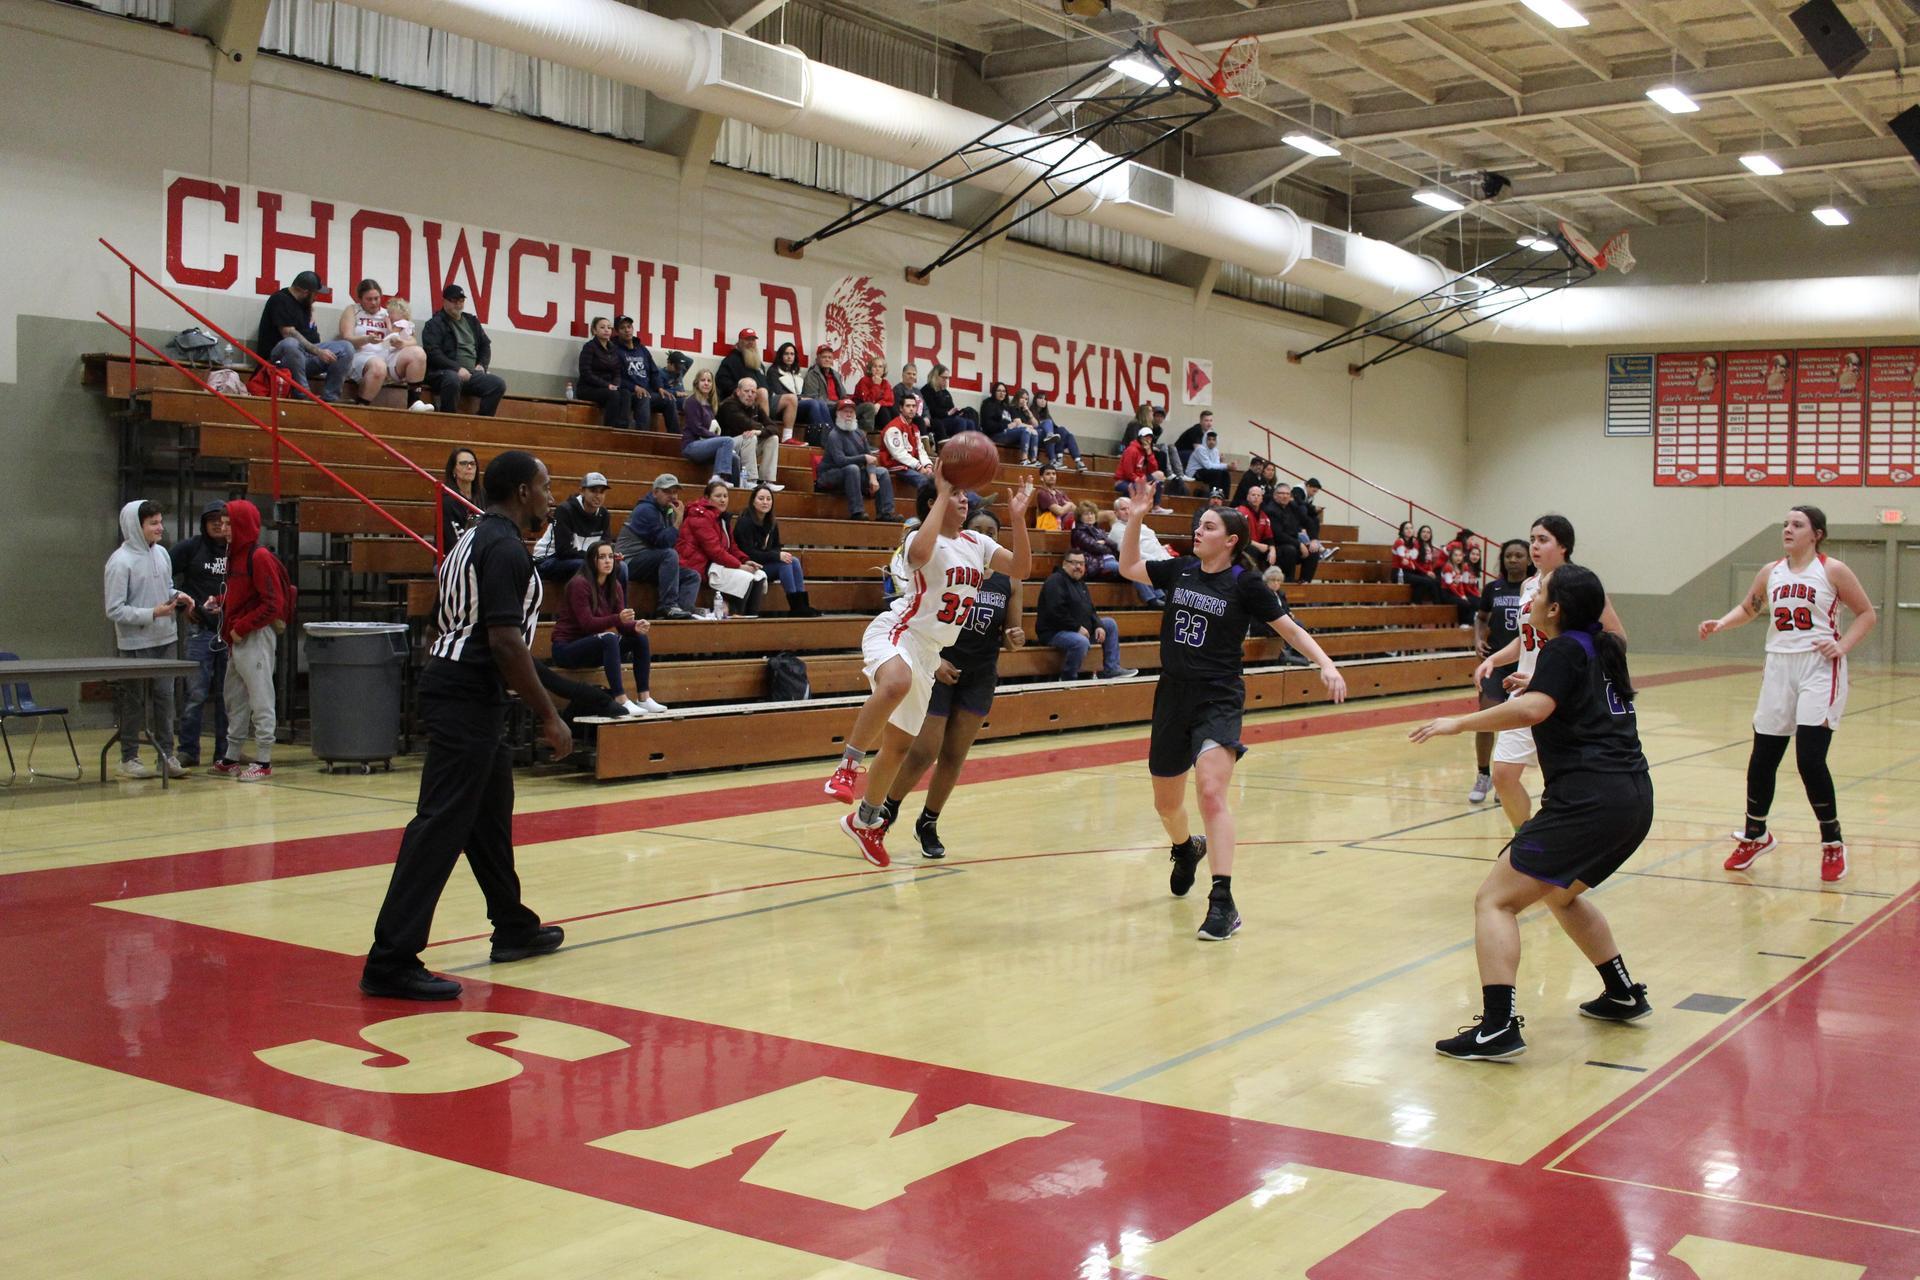 Varsity girls playing basketball